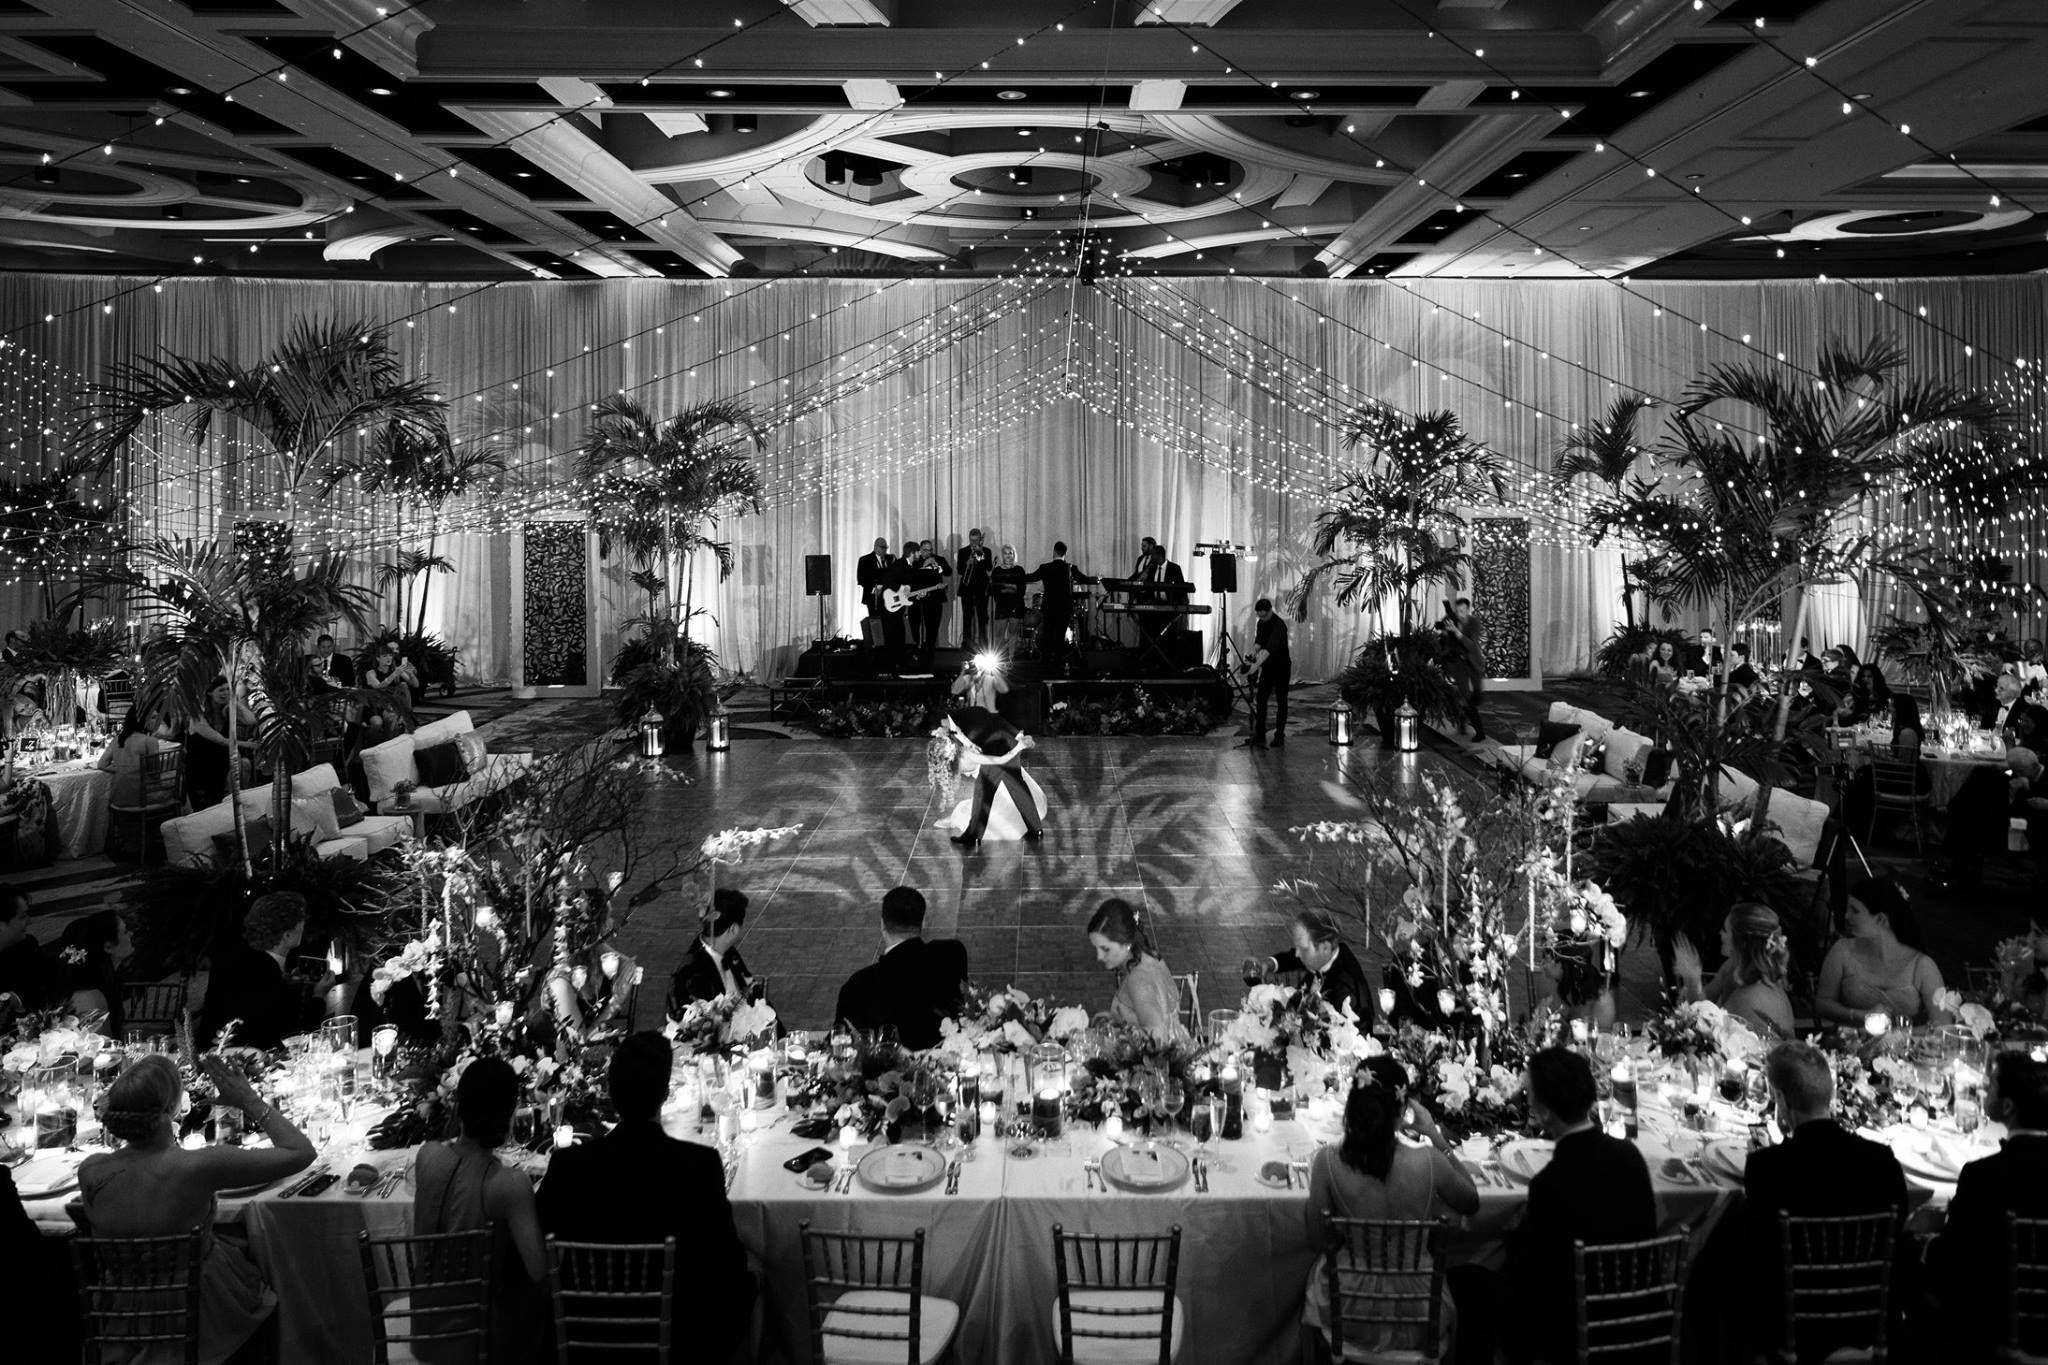 Fern Gully Wedding Planning & Design: Lisa Stoner | LIsa Stoner Events | Photography: Jensen Larson Photography | Floral: Lee James Floral